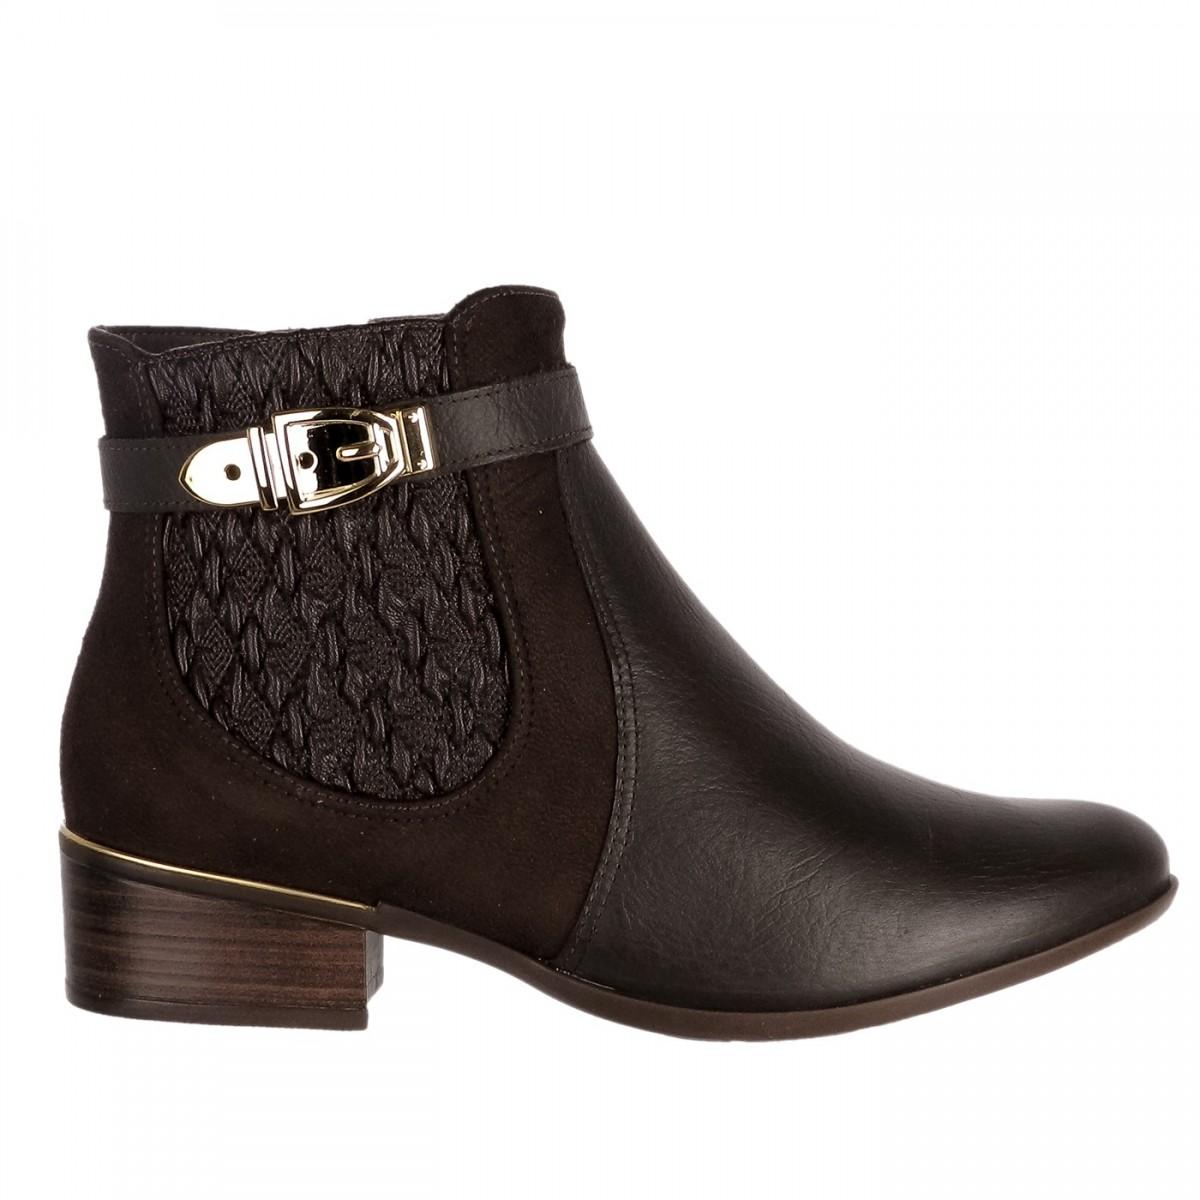 b5c27338b2 Bizz Store - Bota Feminina Comfortflex Cano Curto Couro Marrom